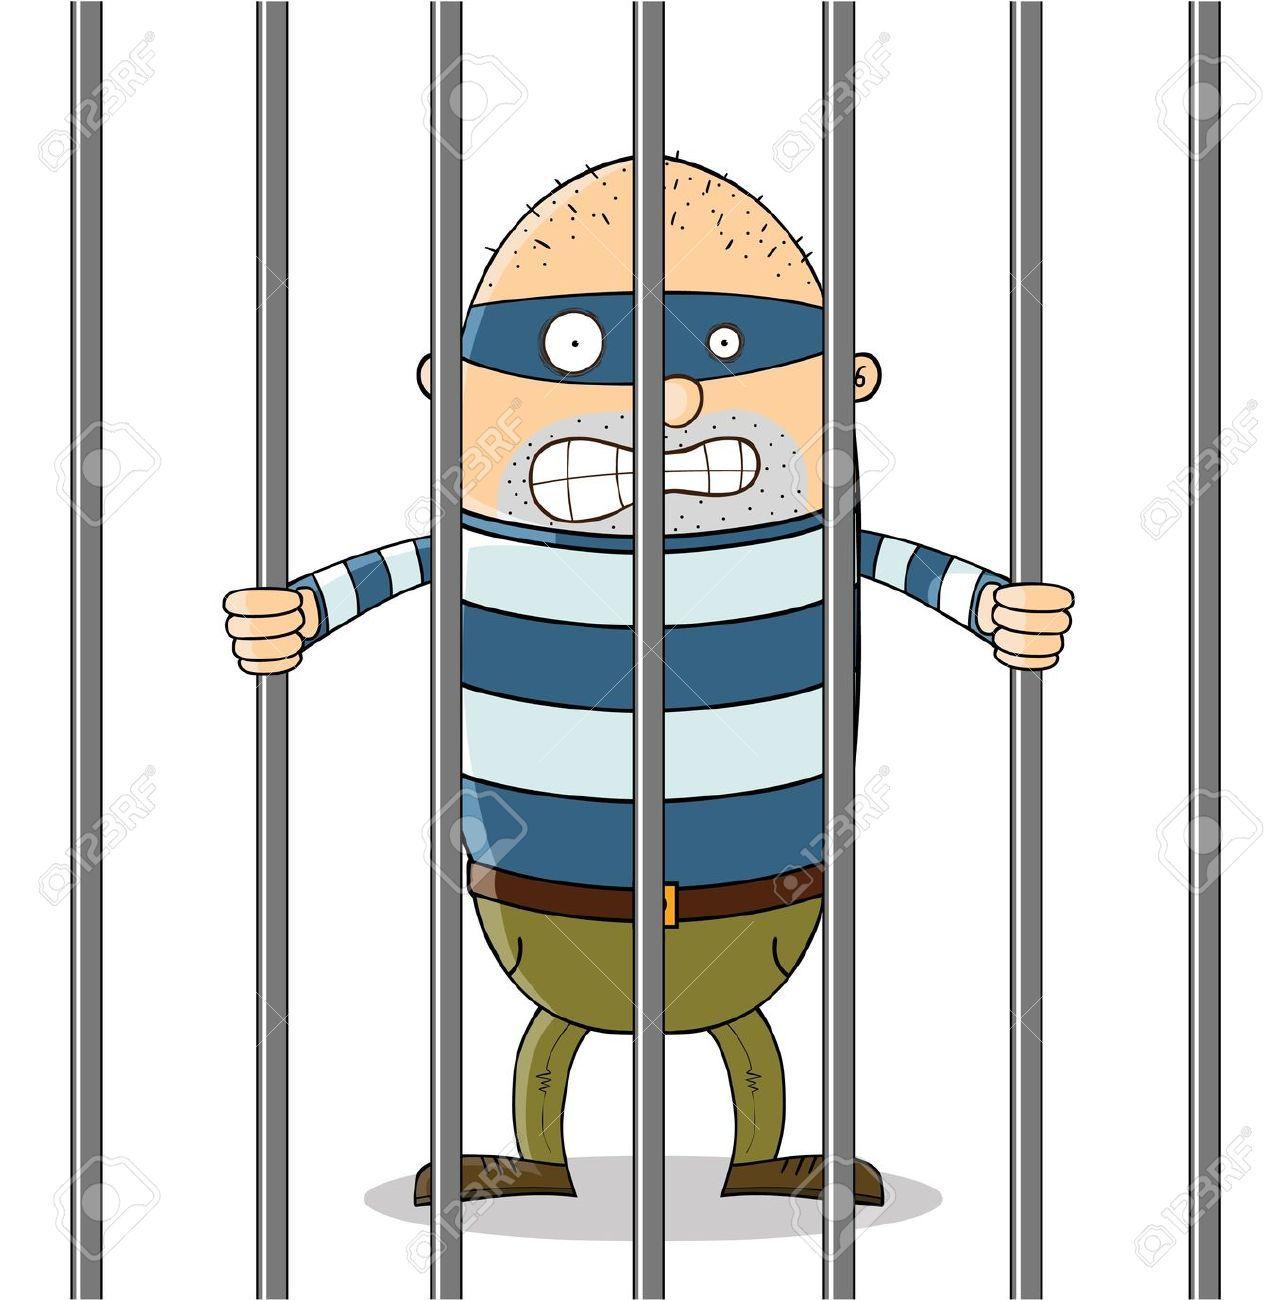 Jail images clipart banner Jail Cartoon Clip Art | Cartoon Man in Jail Clipart (58+) ... banner